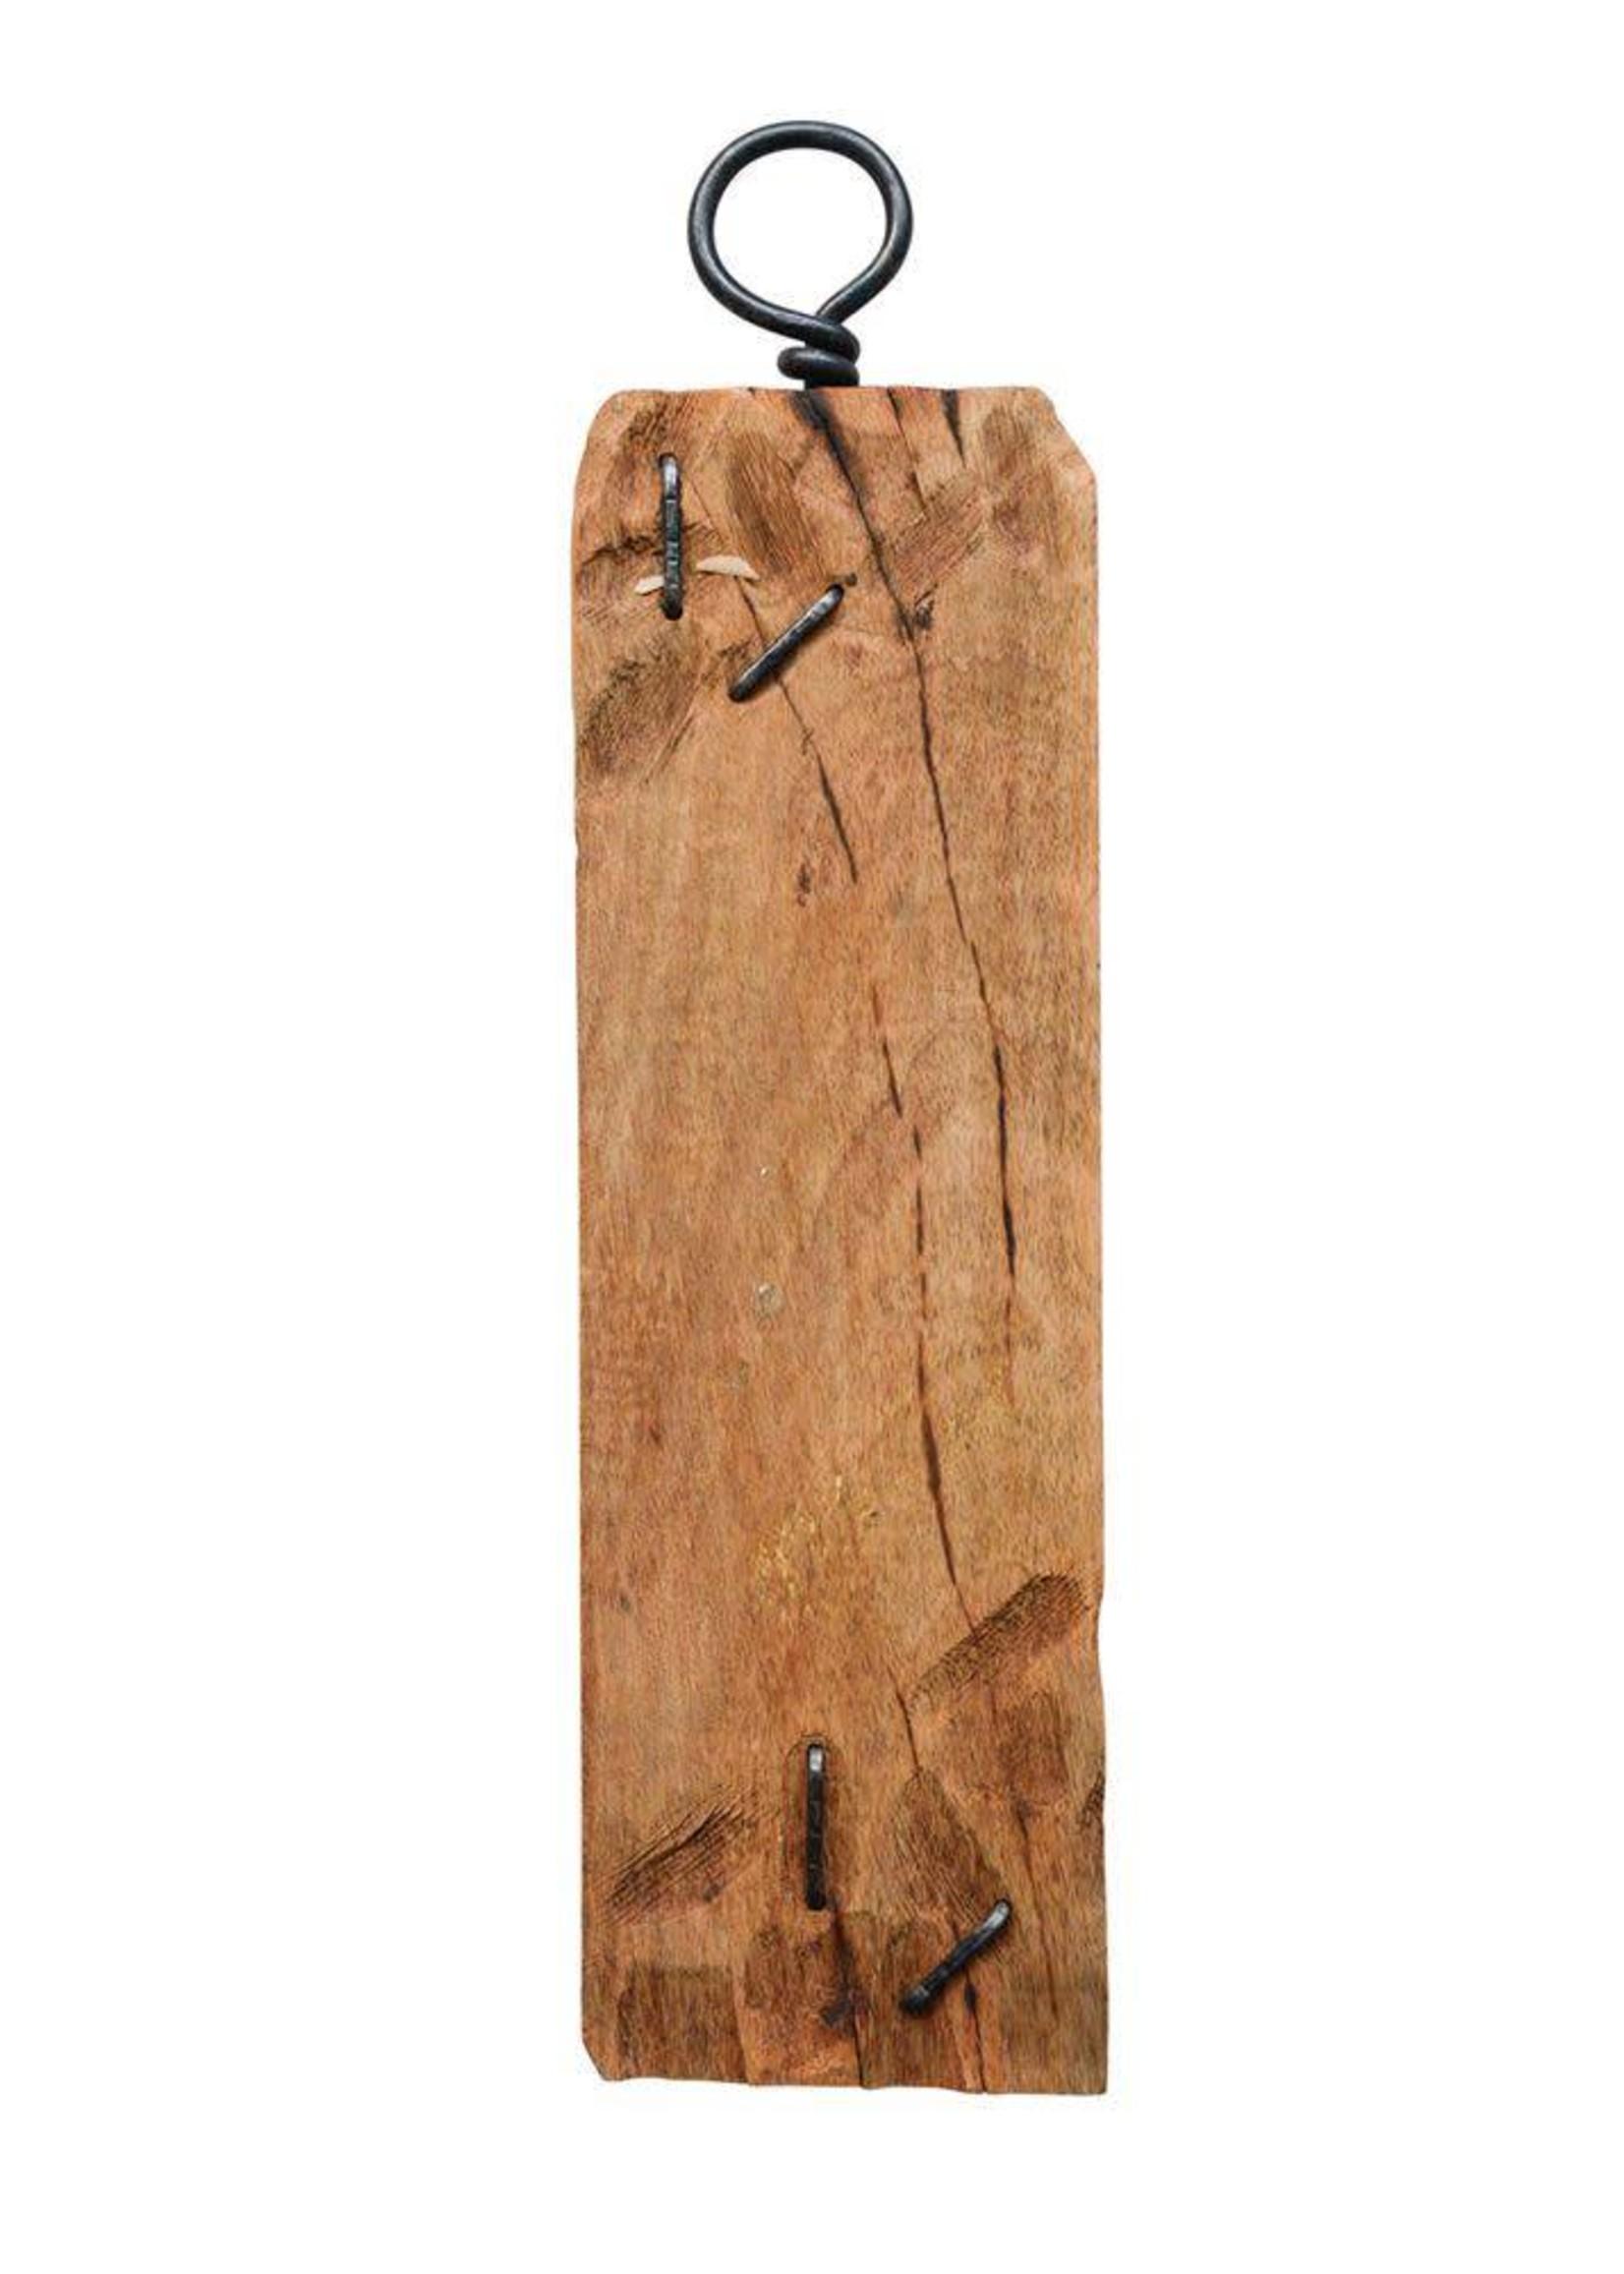 Mango Wood Tray w/ Metal Hook